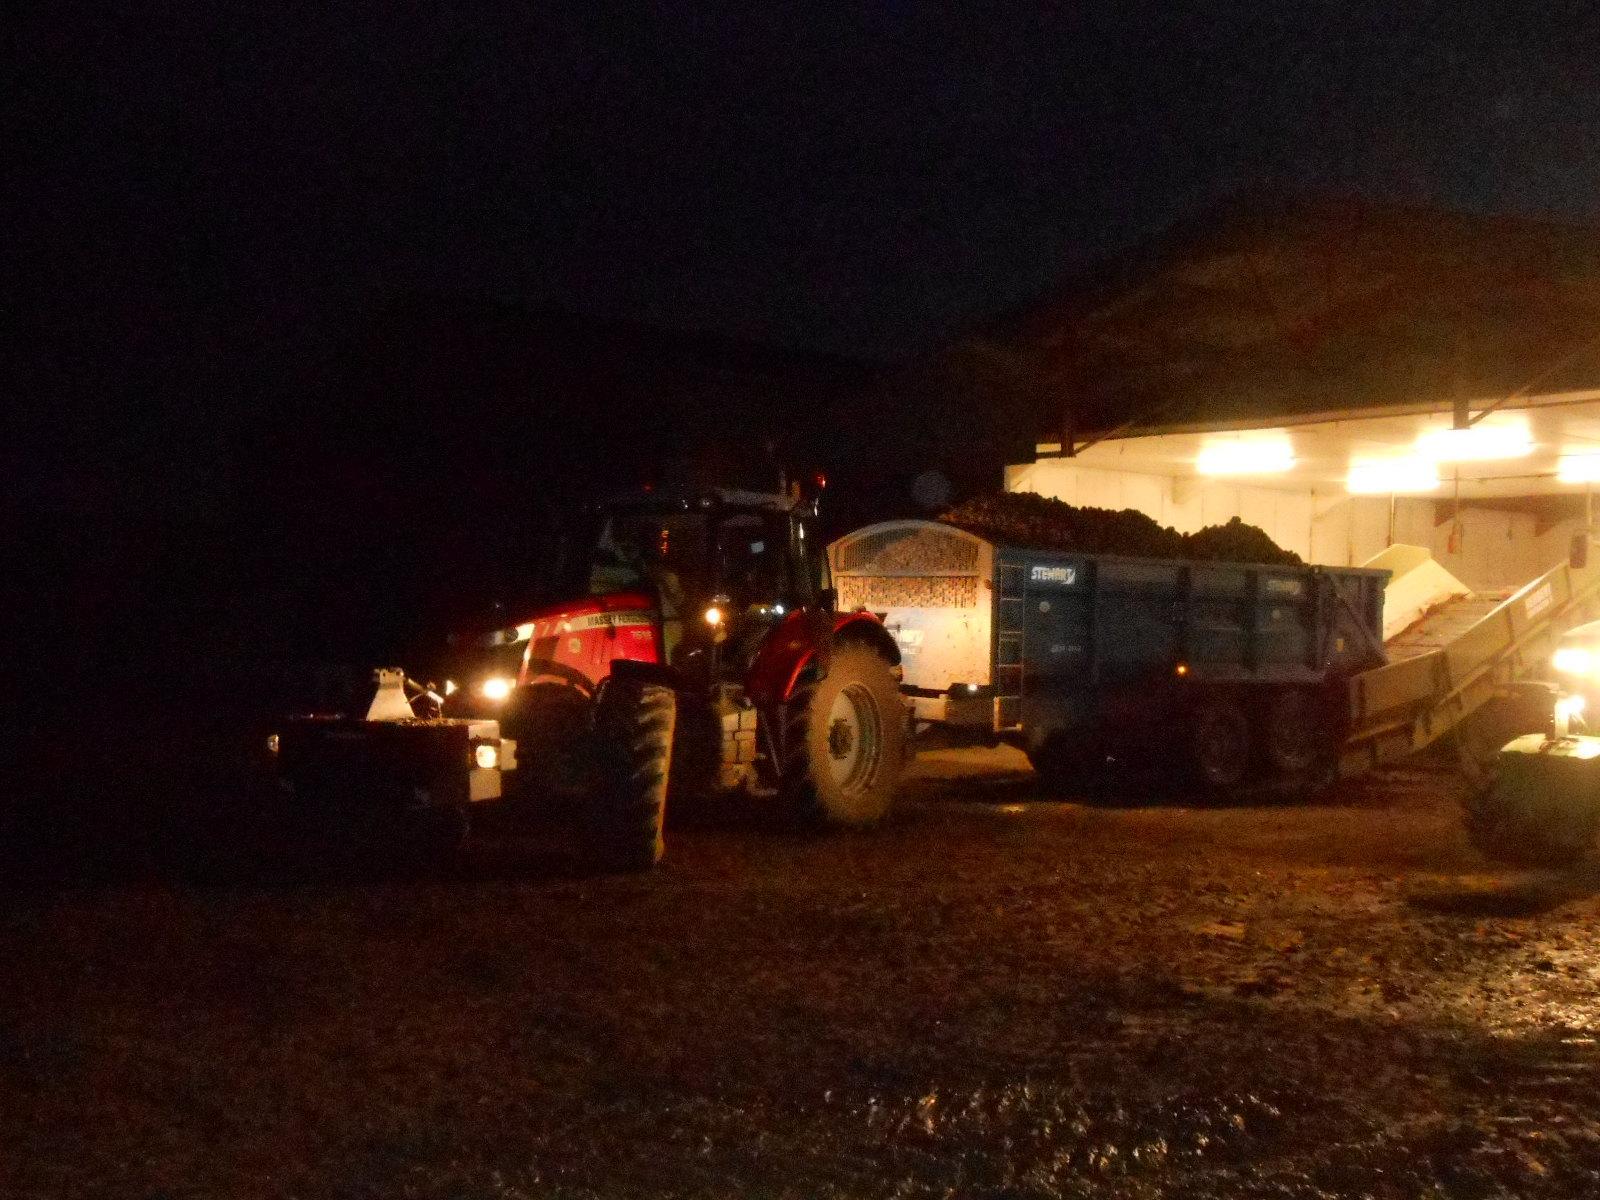 Night work on potatoes